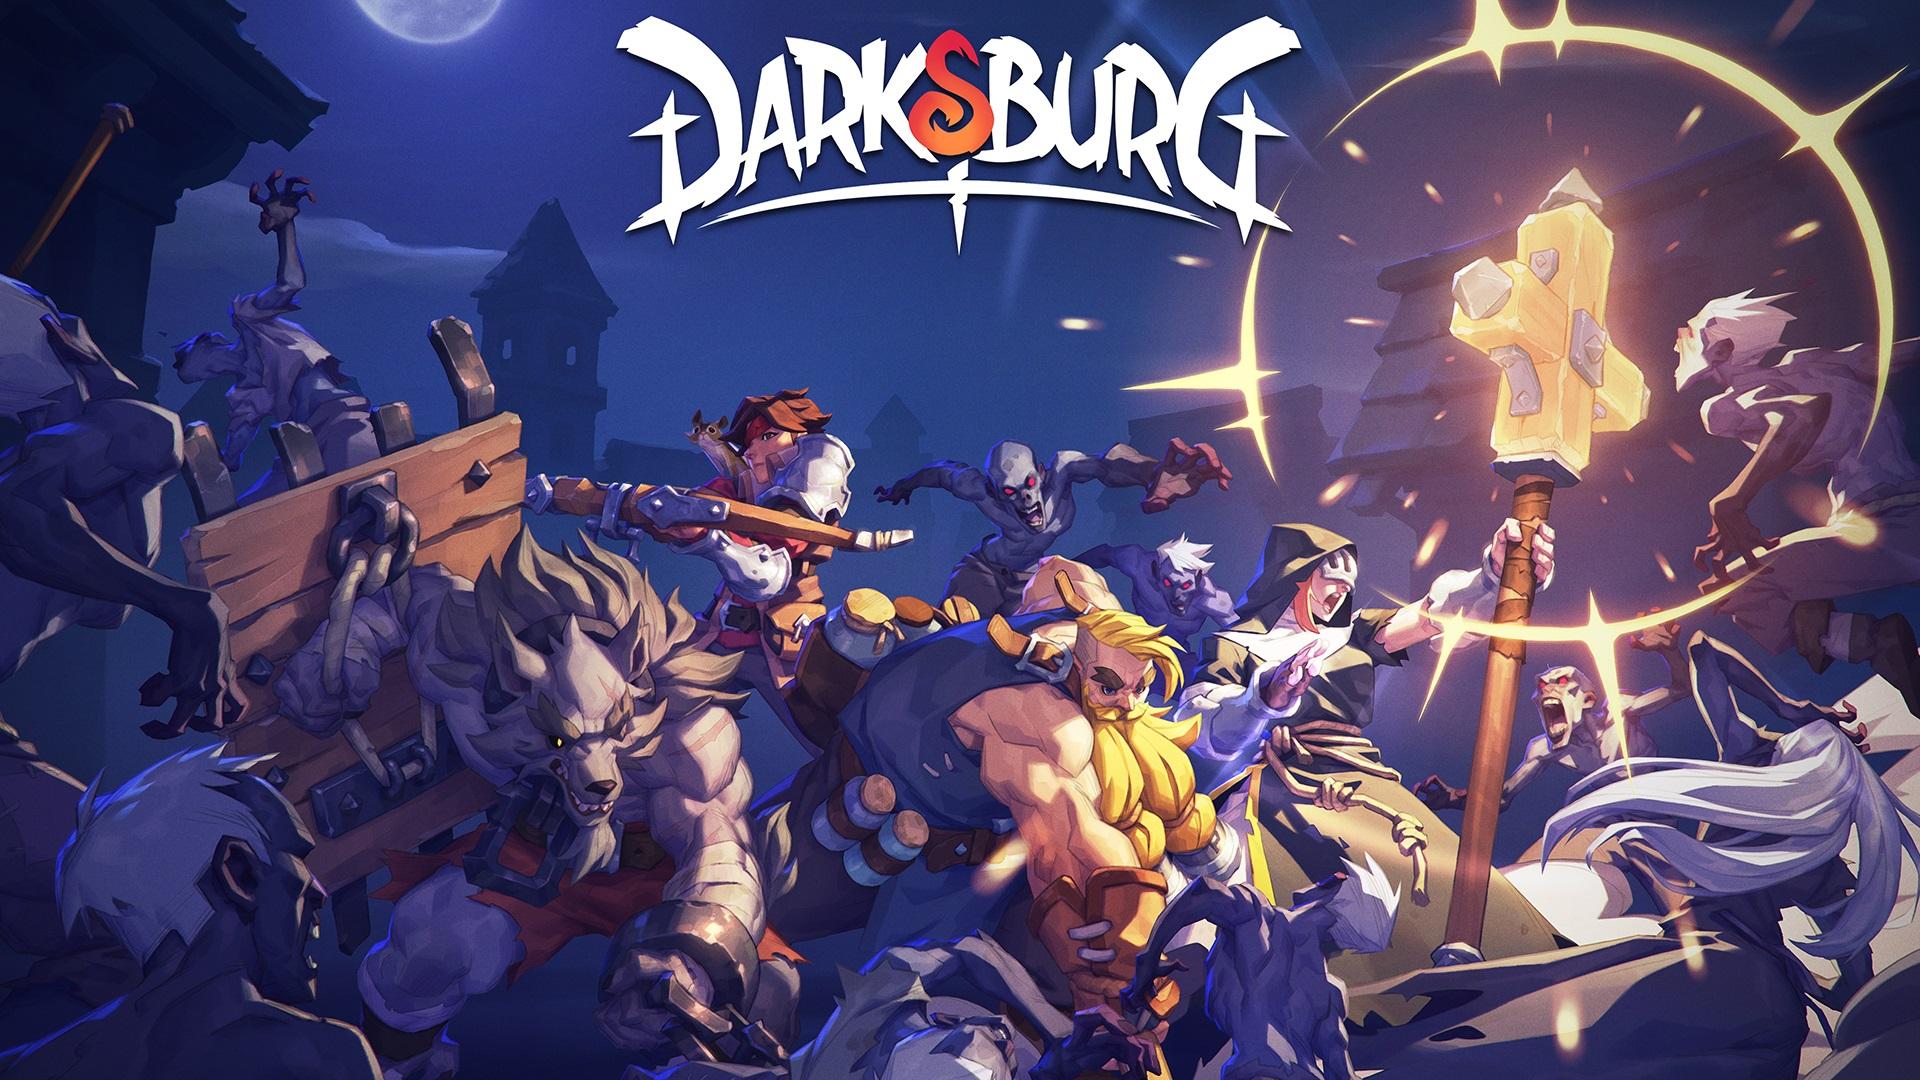 Contest: Spoop your pants with Darksburg on Steam screenshot